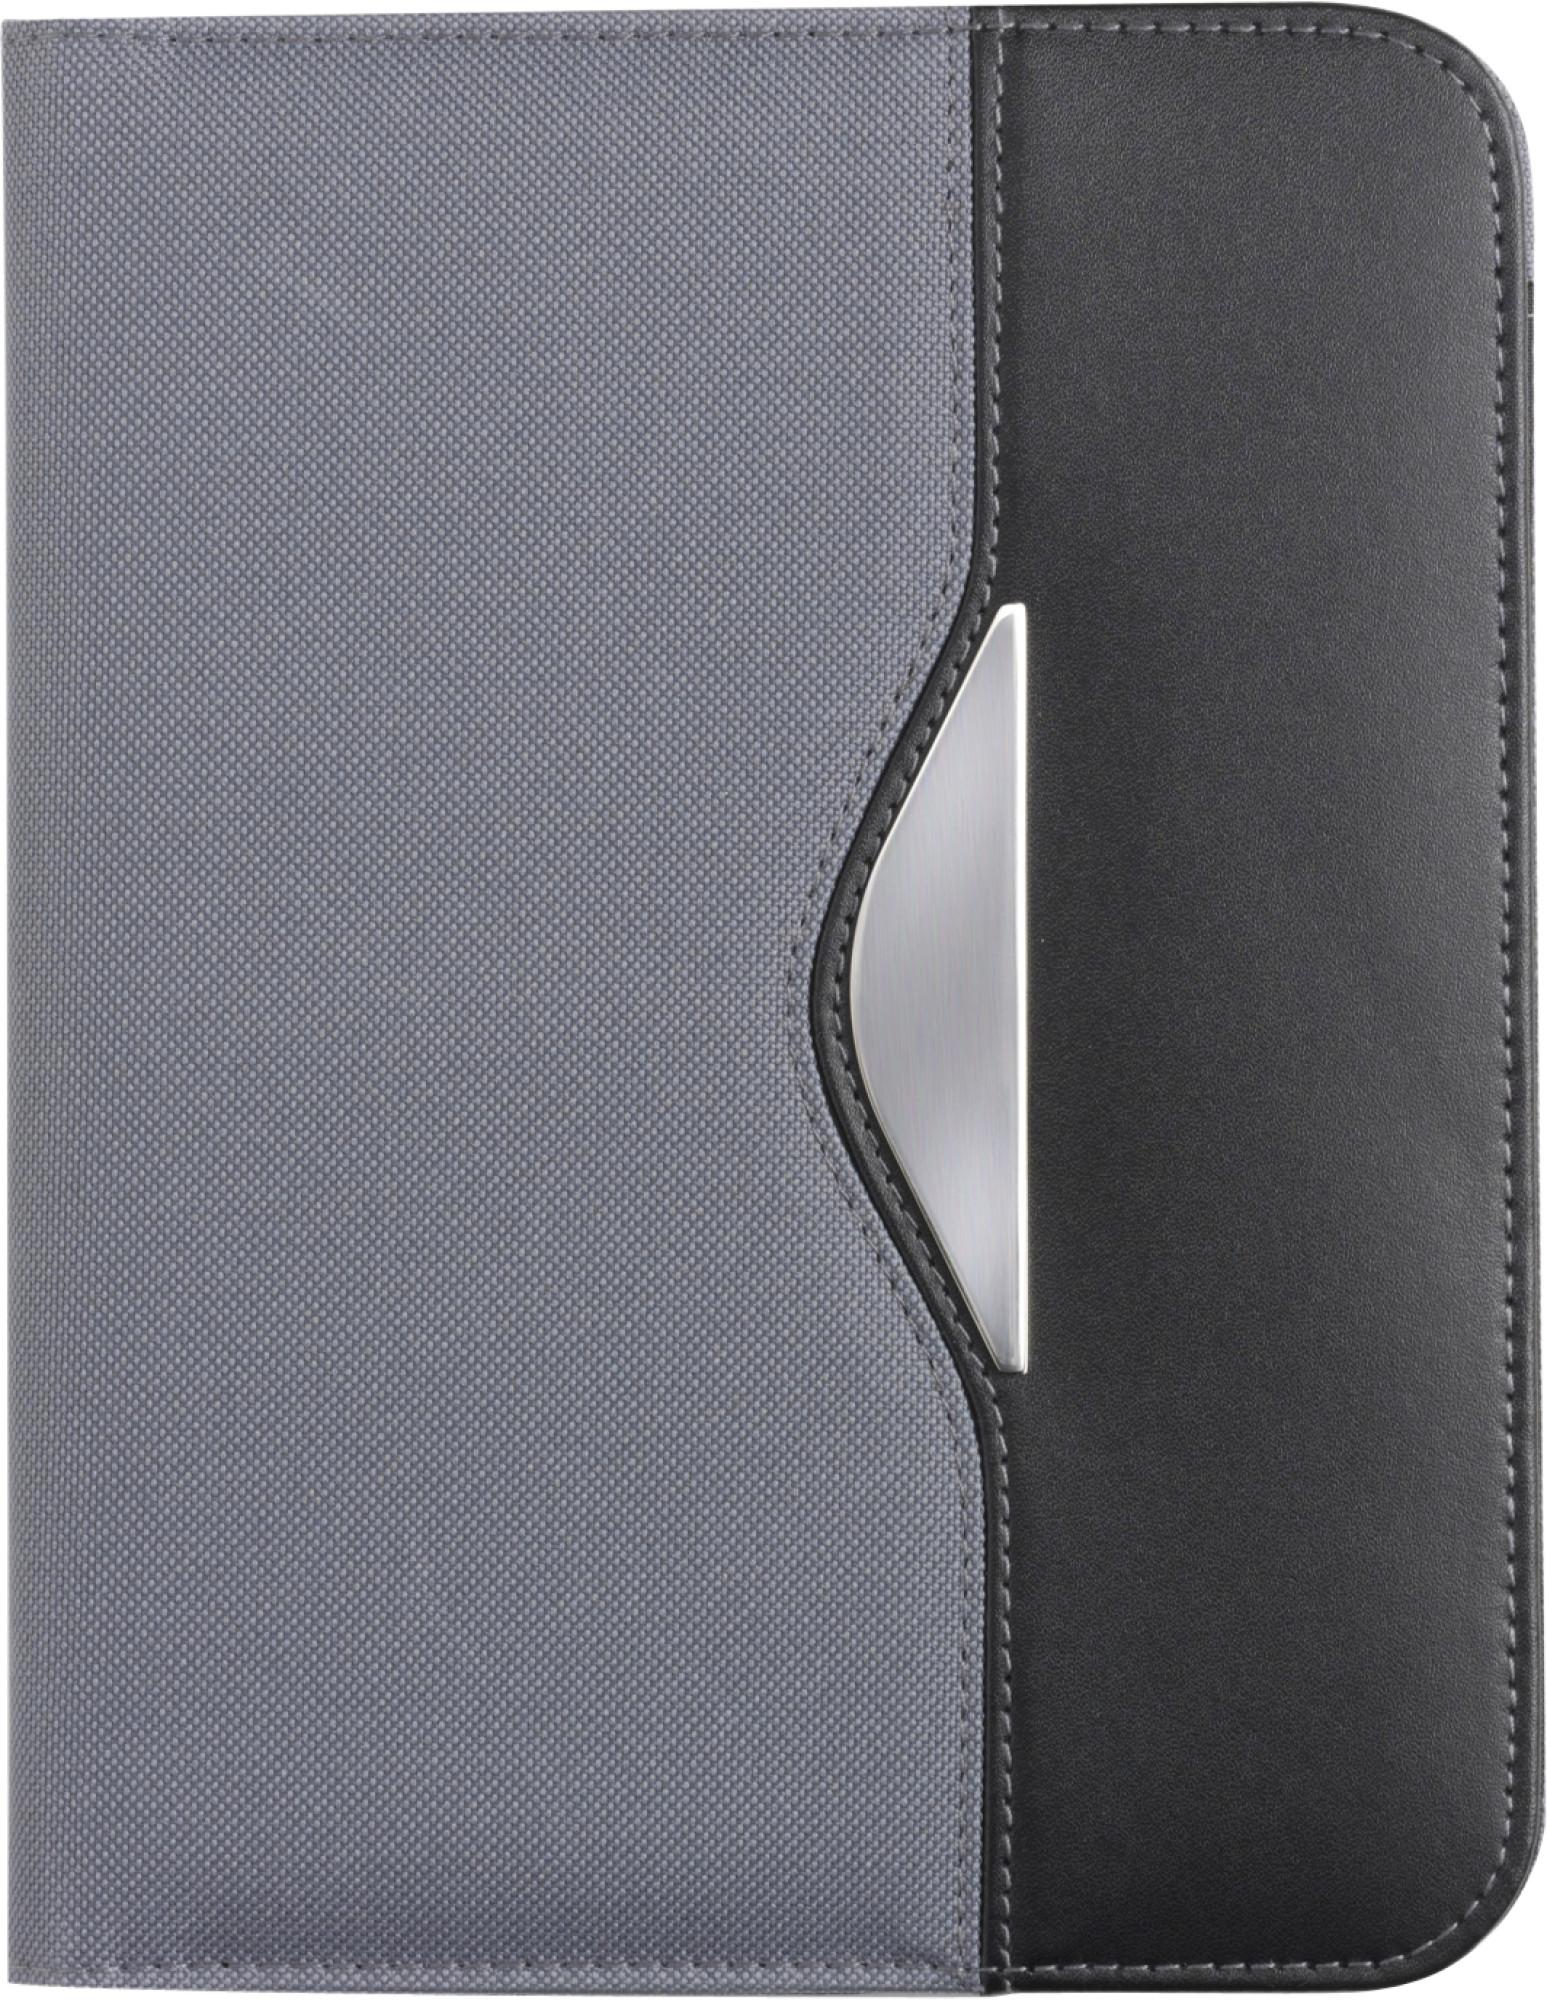 Branded A5 Conference folder